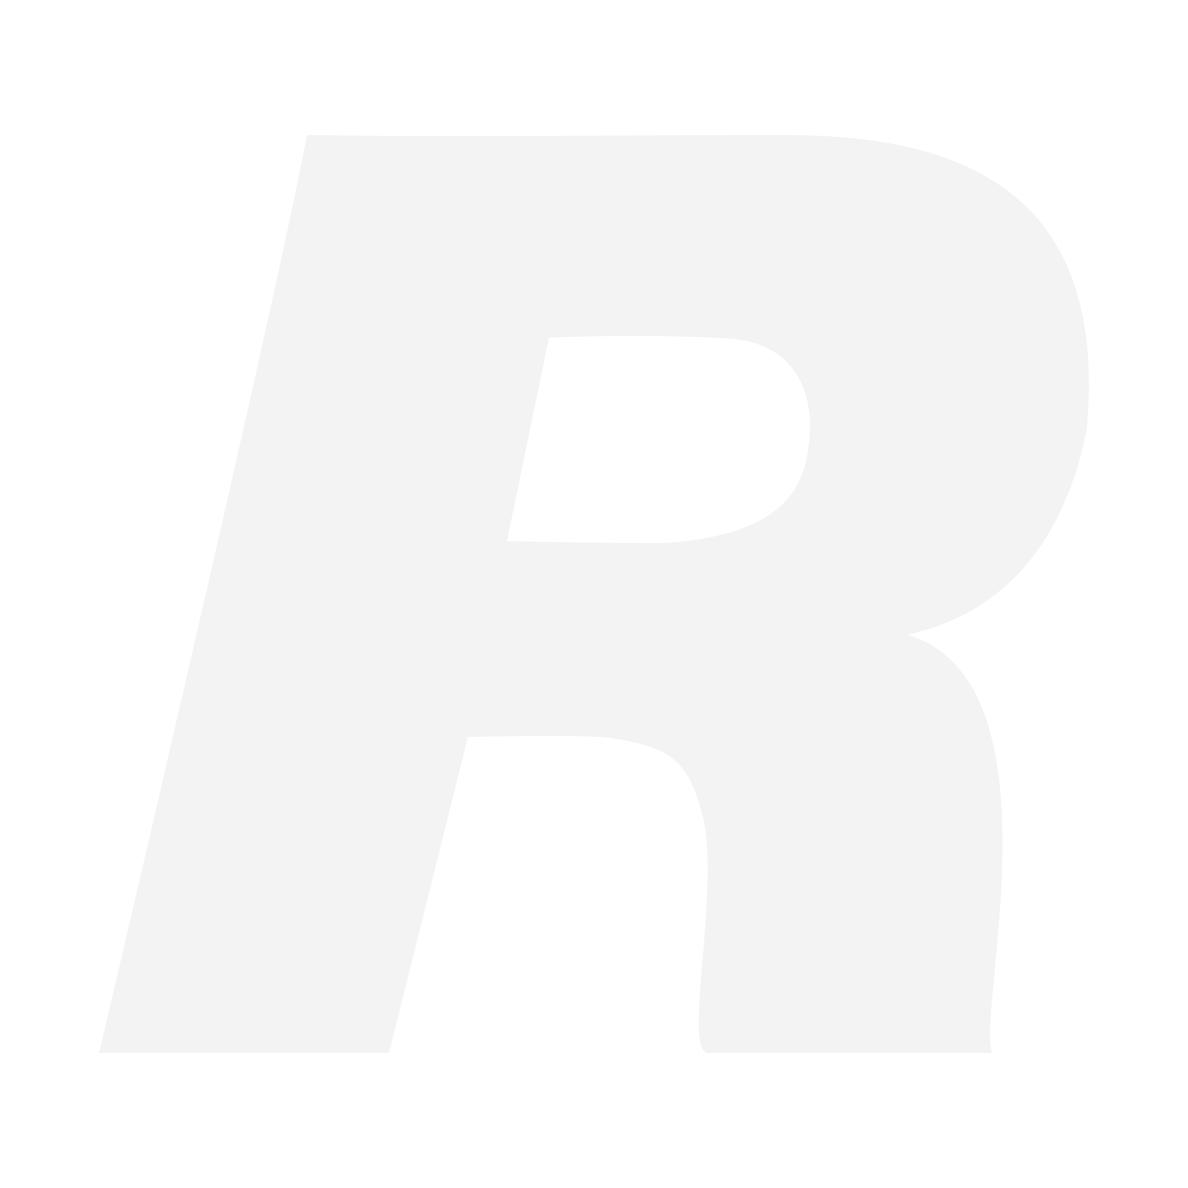 MANFROTTO MVA523W SYMPLA RODS PAIR